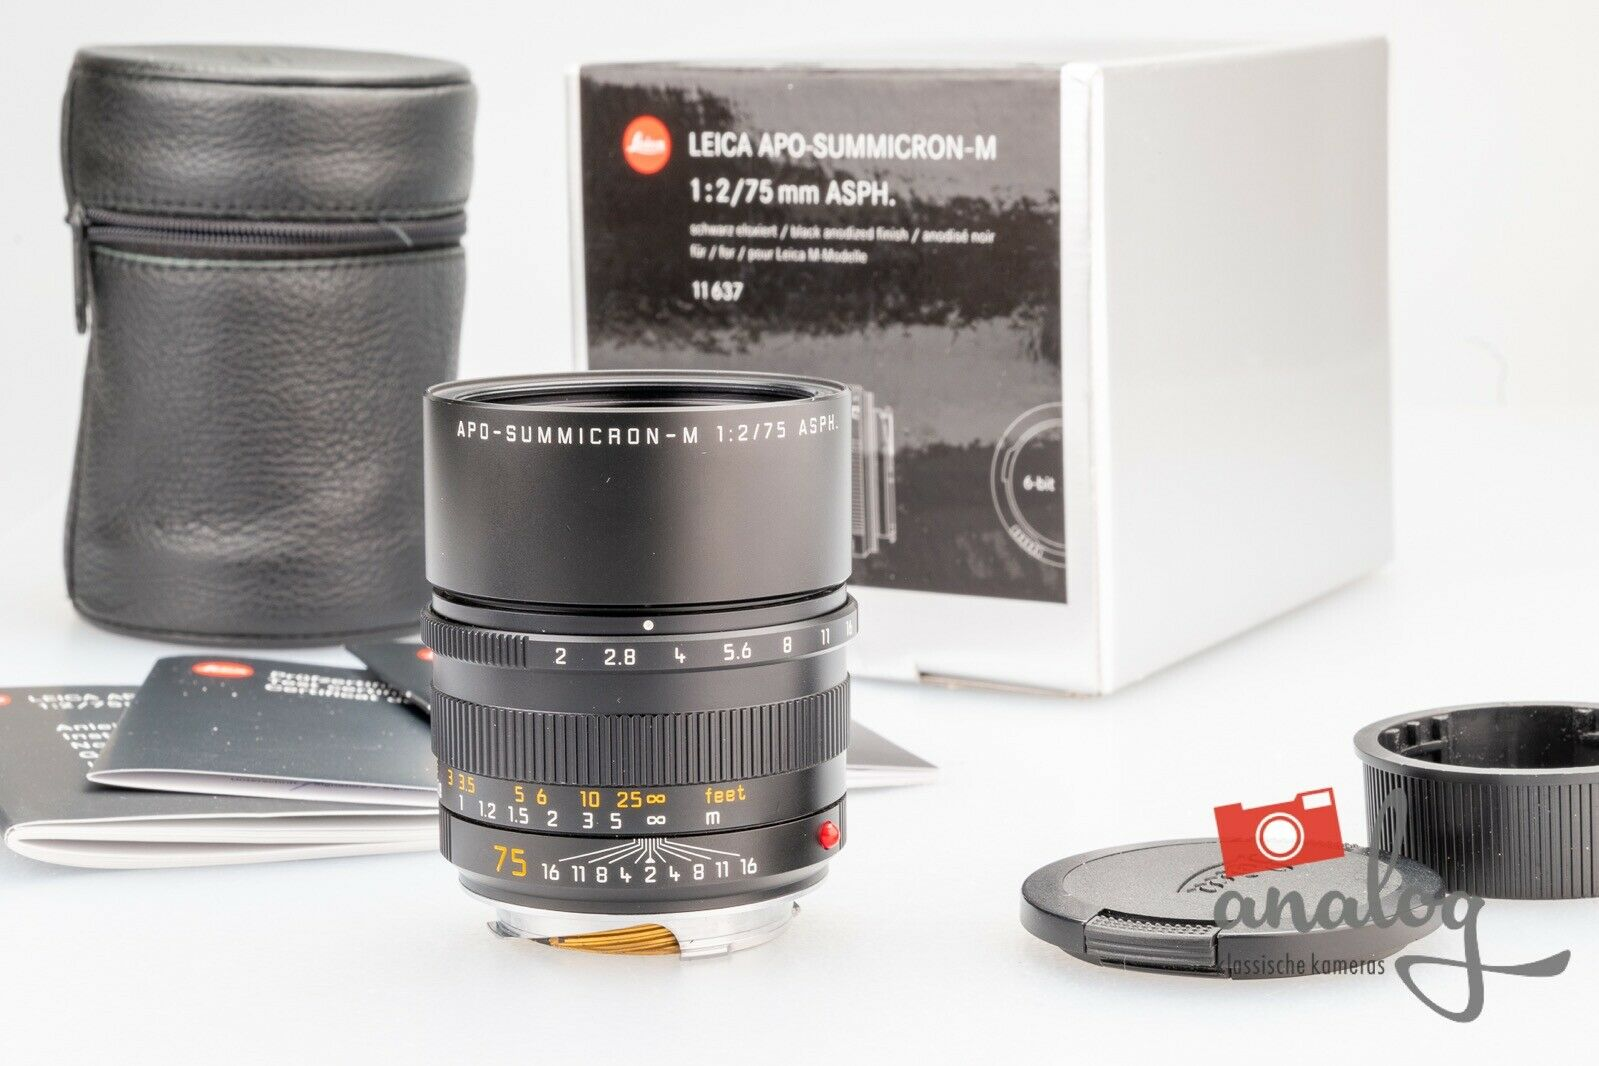 Leica APO-Summicron-M 75mm 2.0 ASPH. - 11637 - TOPZUSTAND